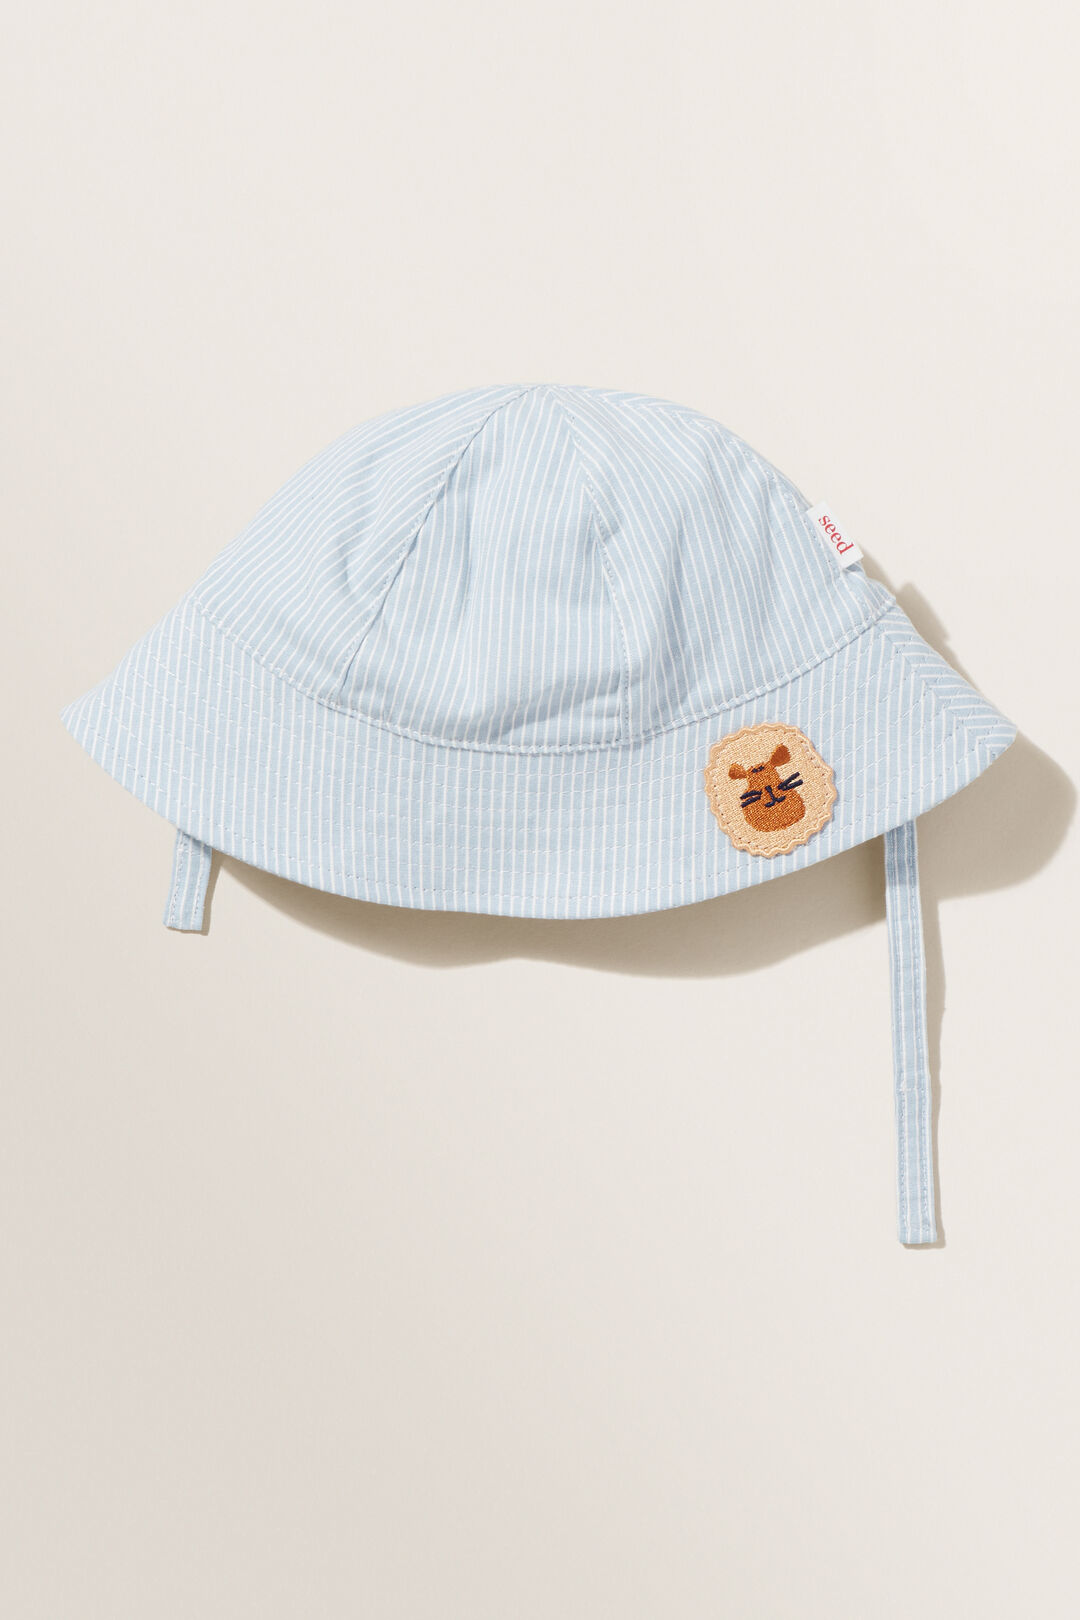 Stripe Patch Sun Hat  Multi  hi-res